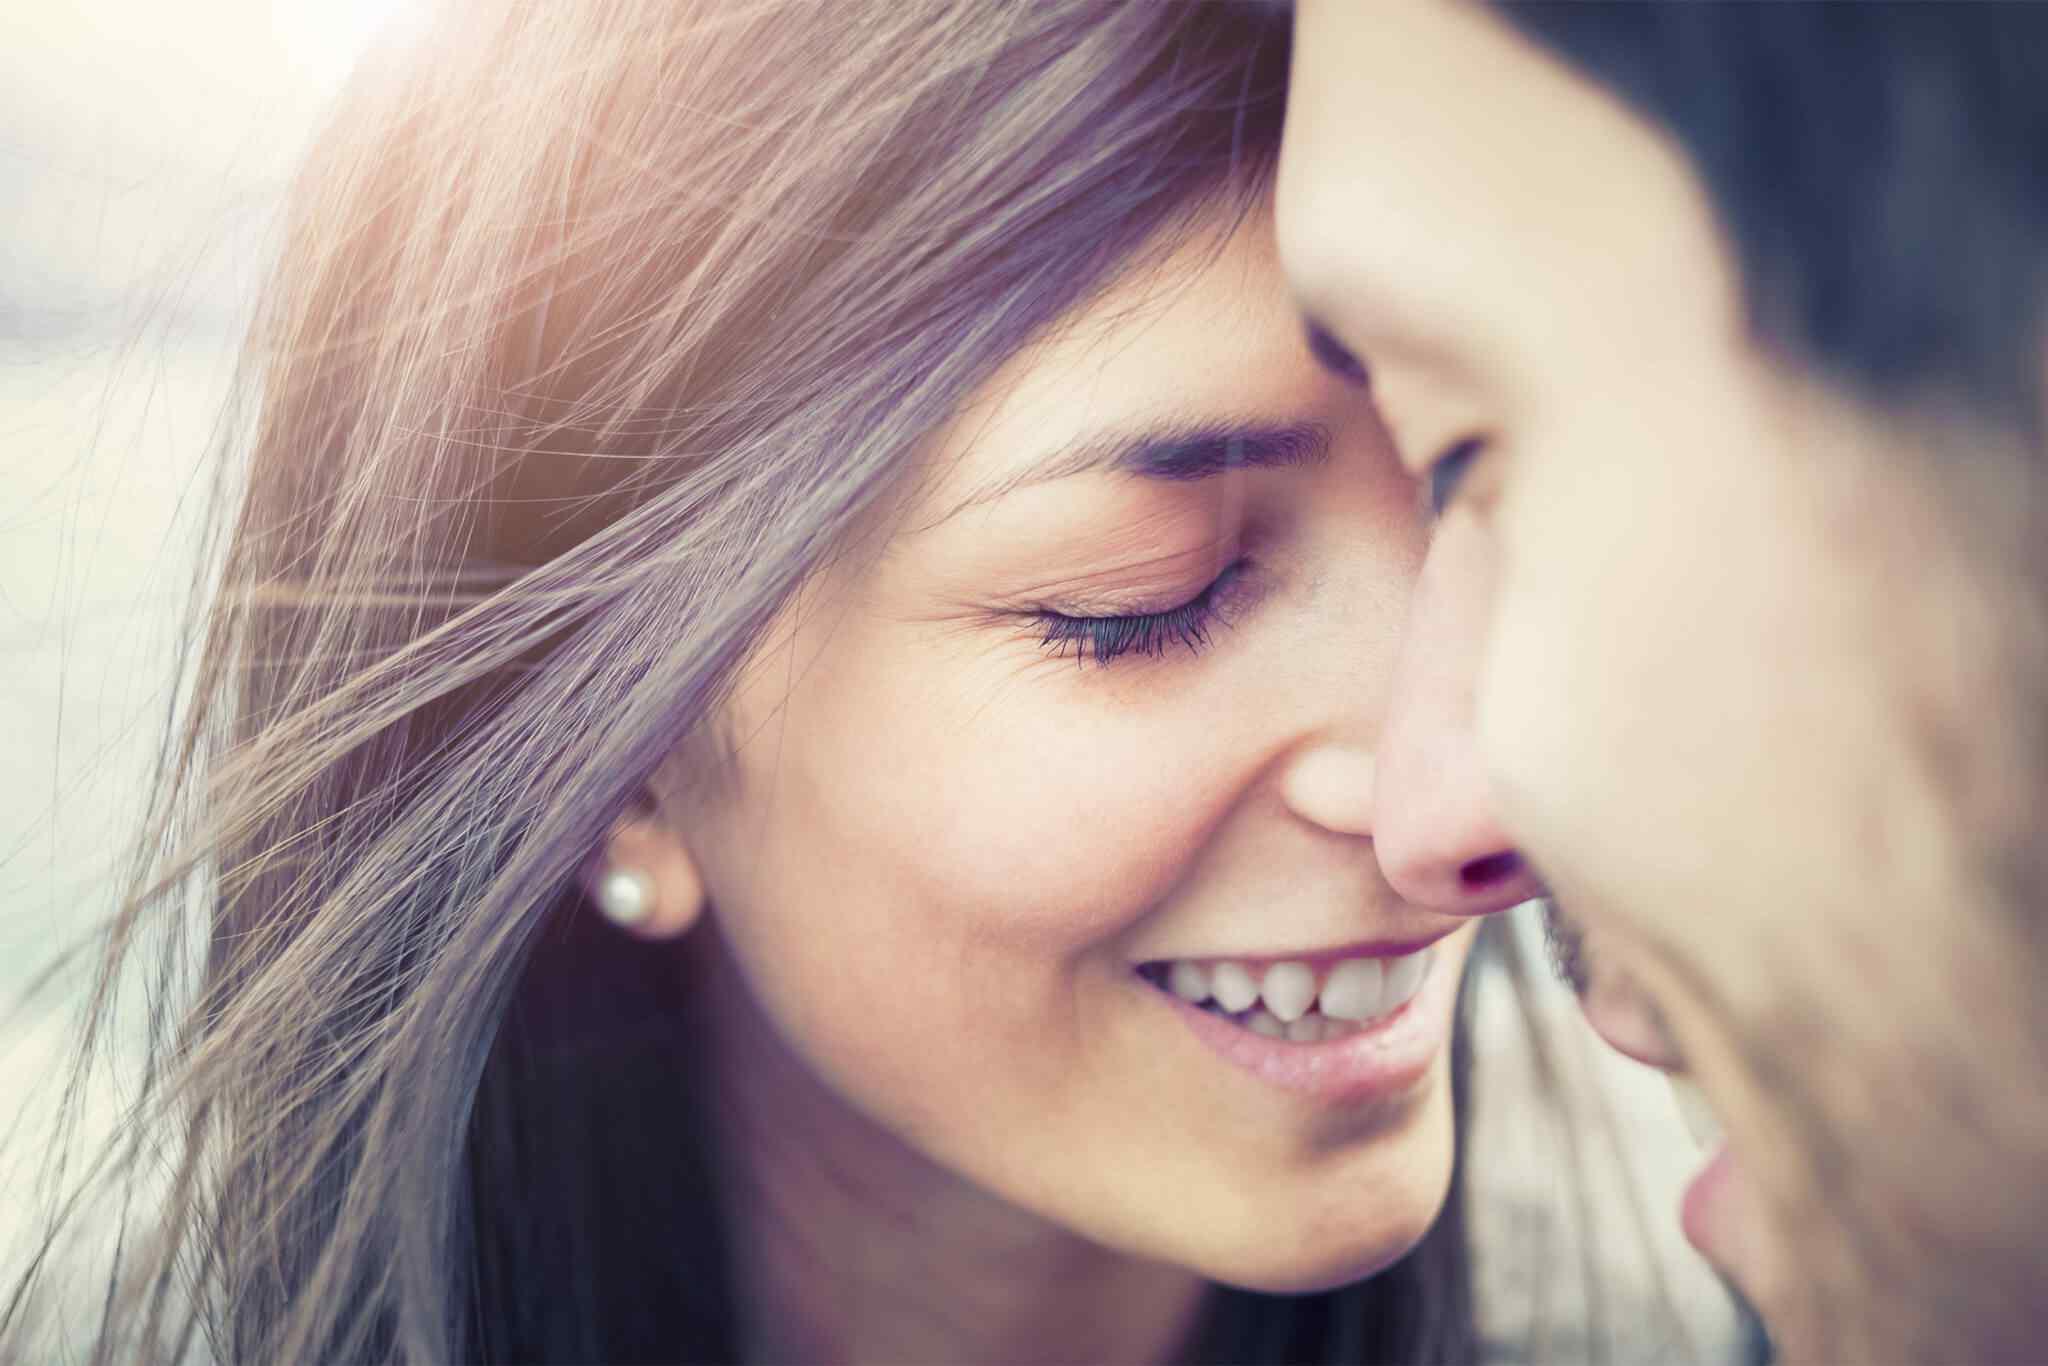 https://gotitasdepoliamor.com/wp-content/uploads/2018/01/img-class-marriage-01.jpg